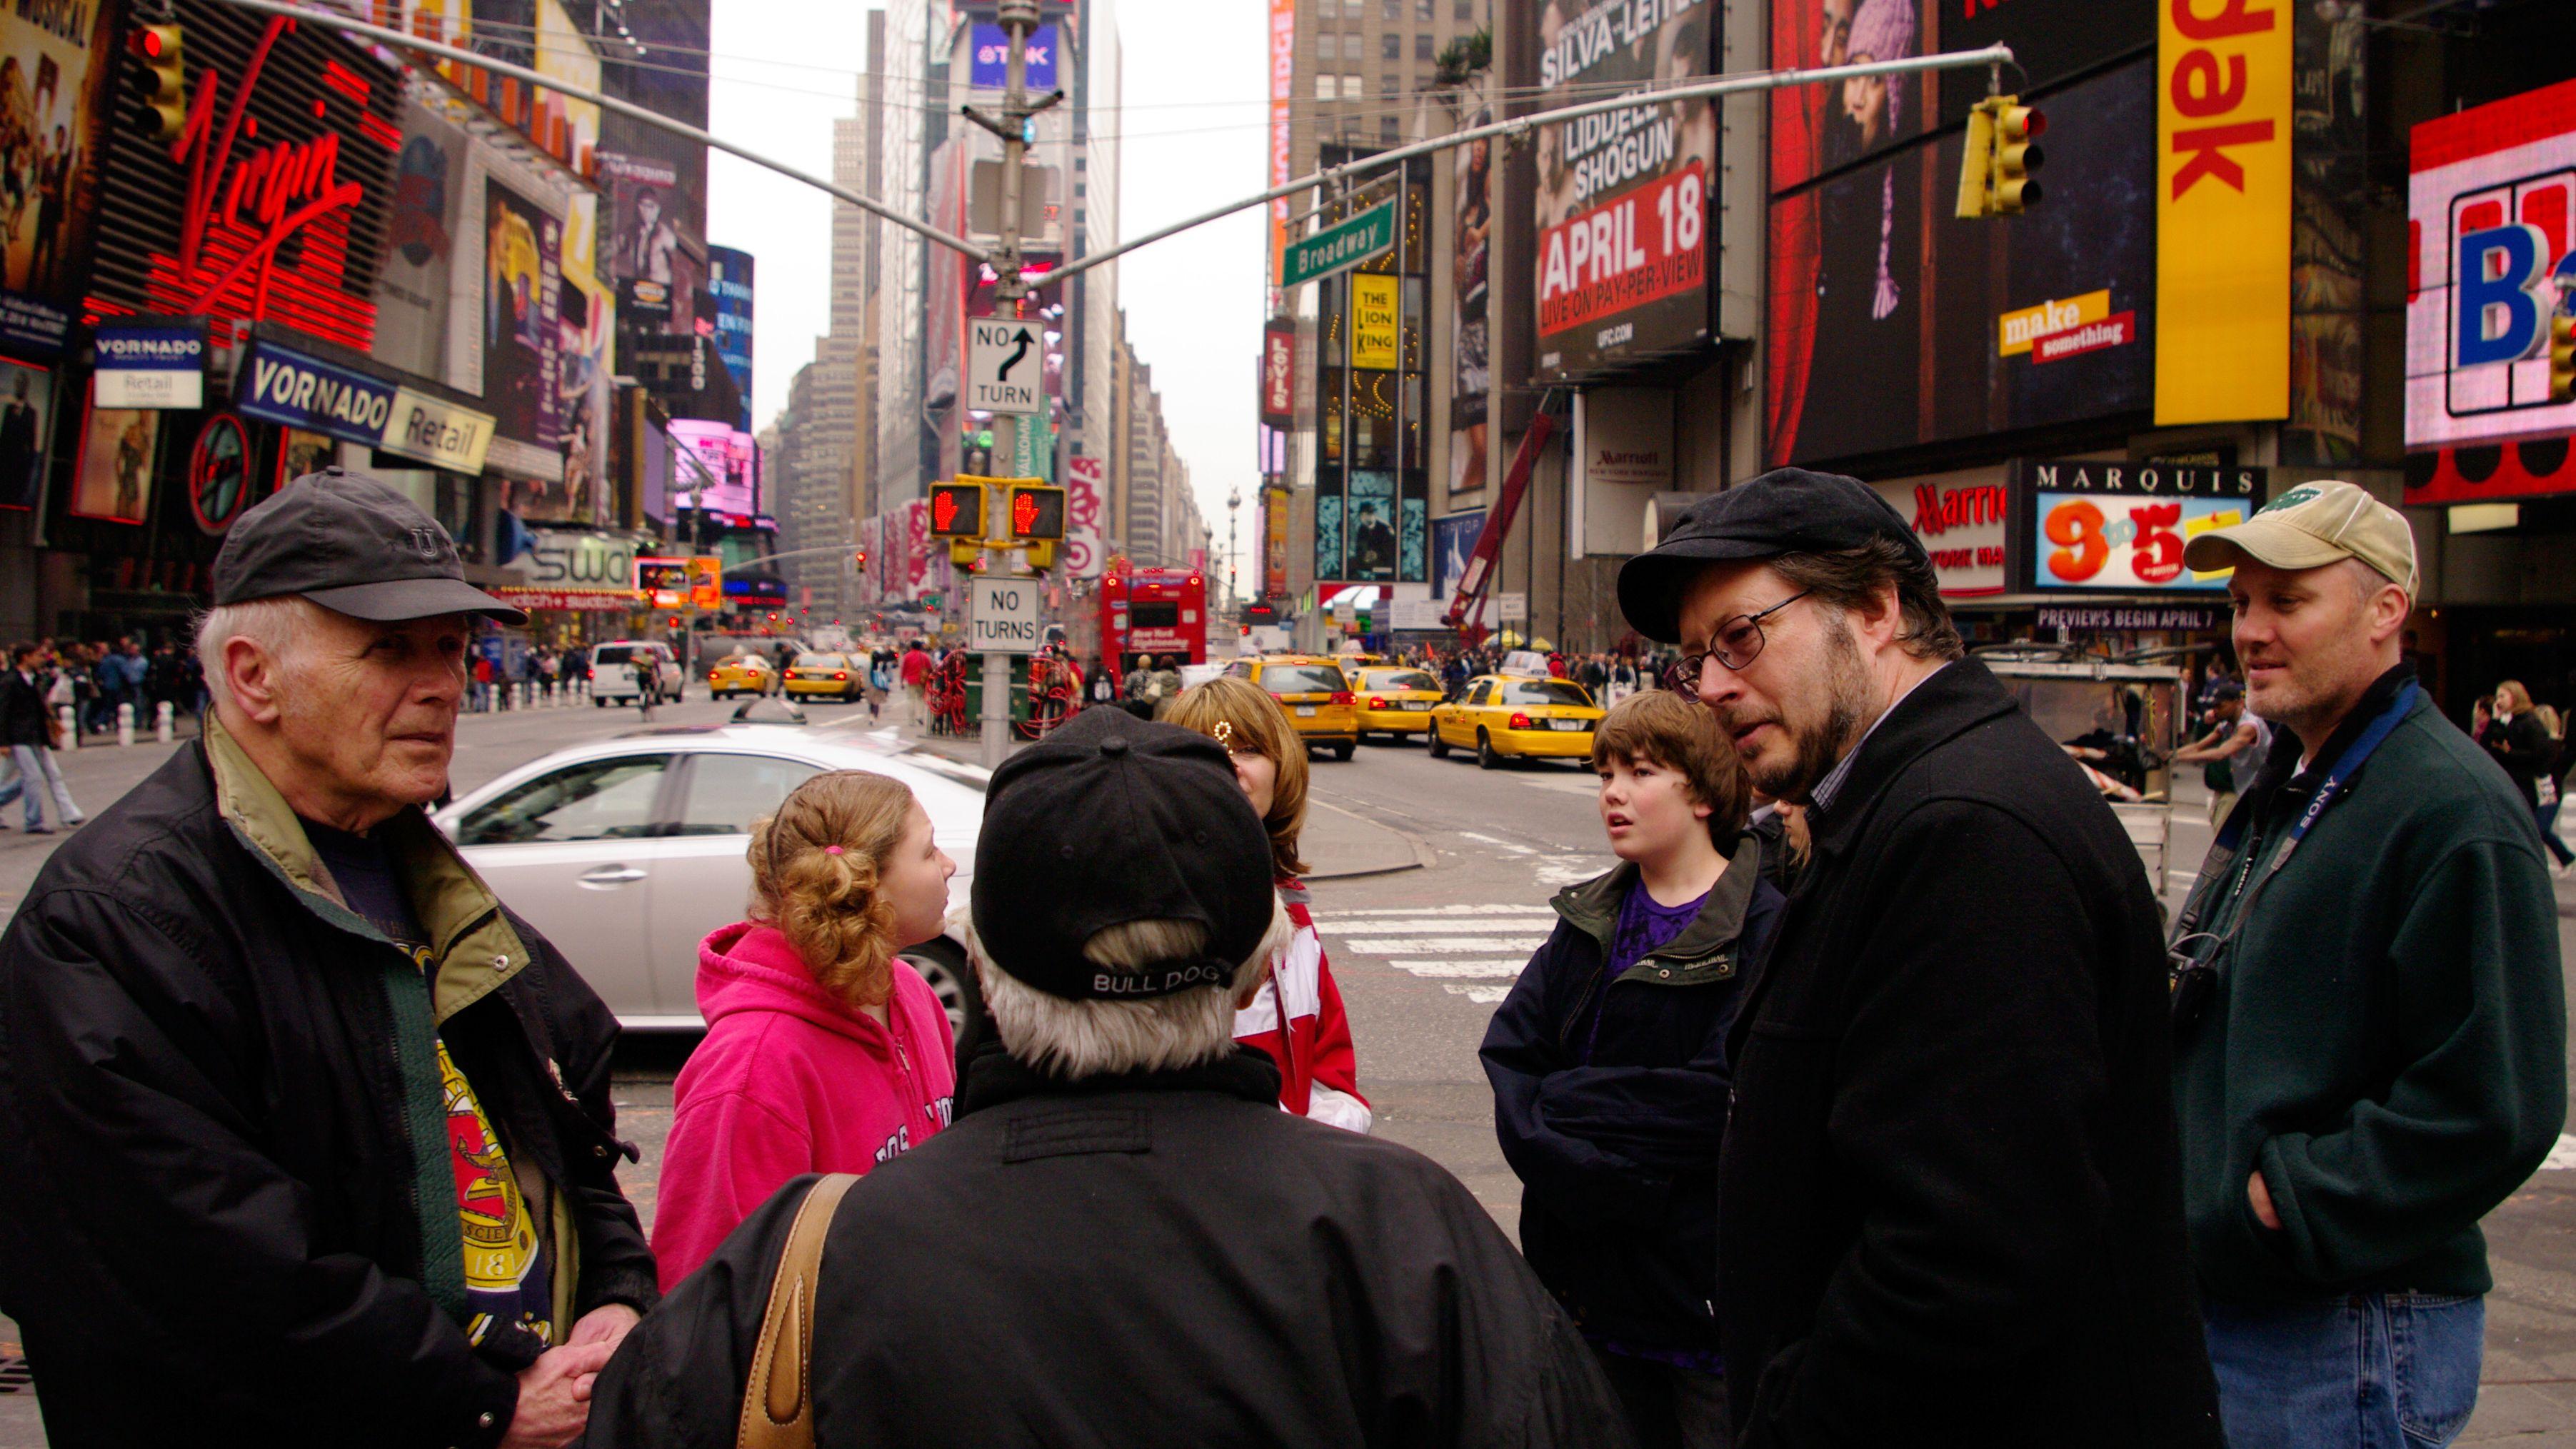 Broadway, New York, New York, Stati Uniti d'America